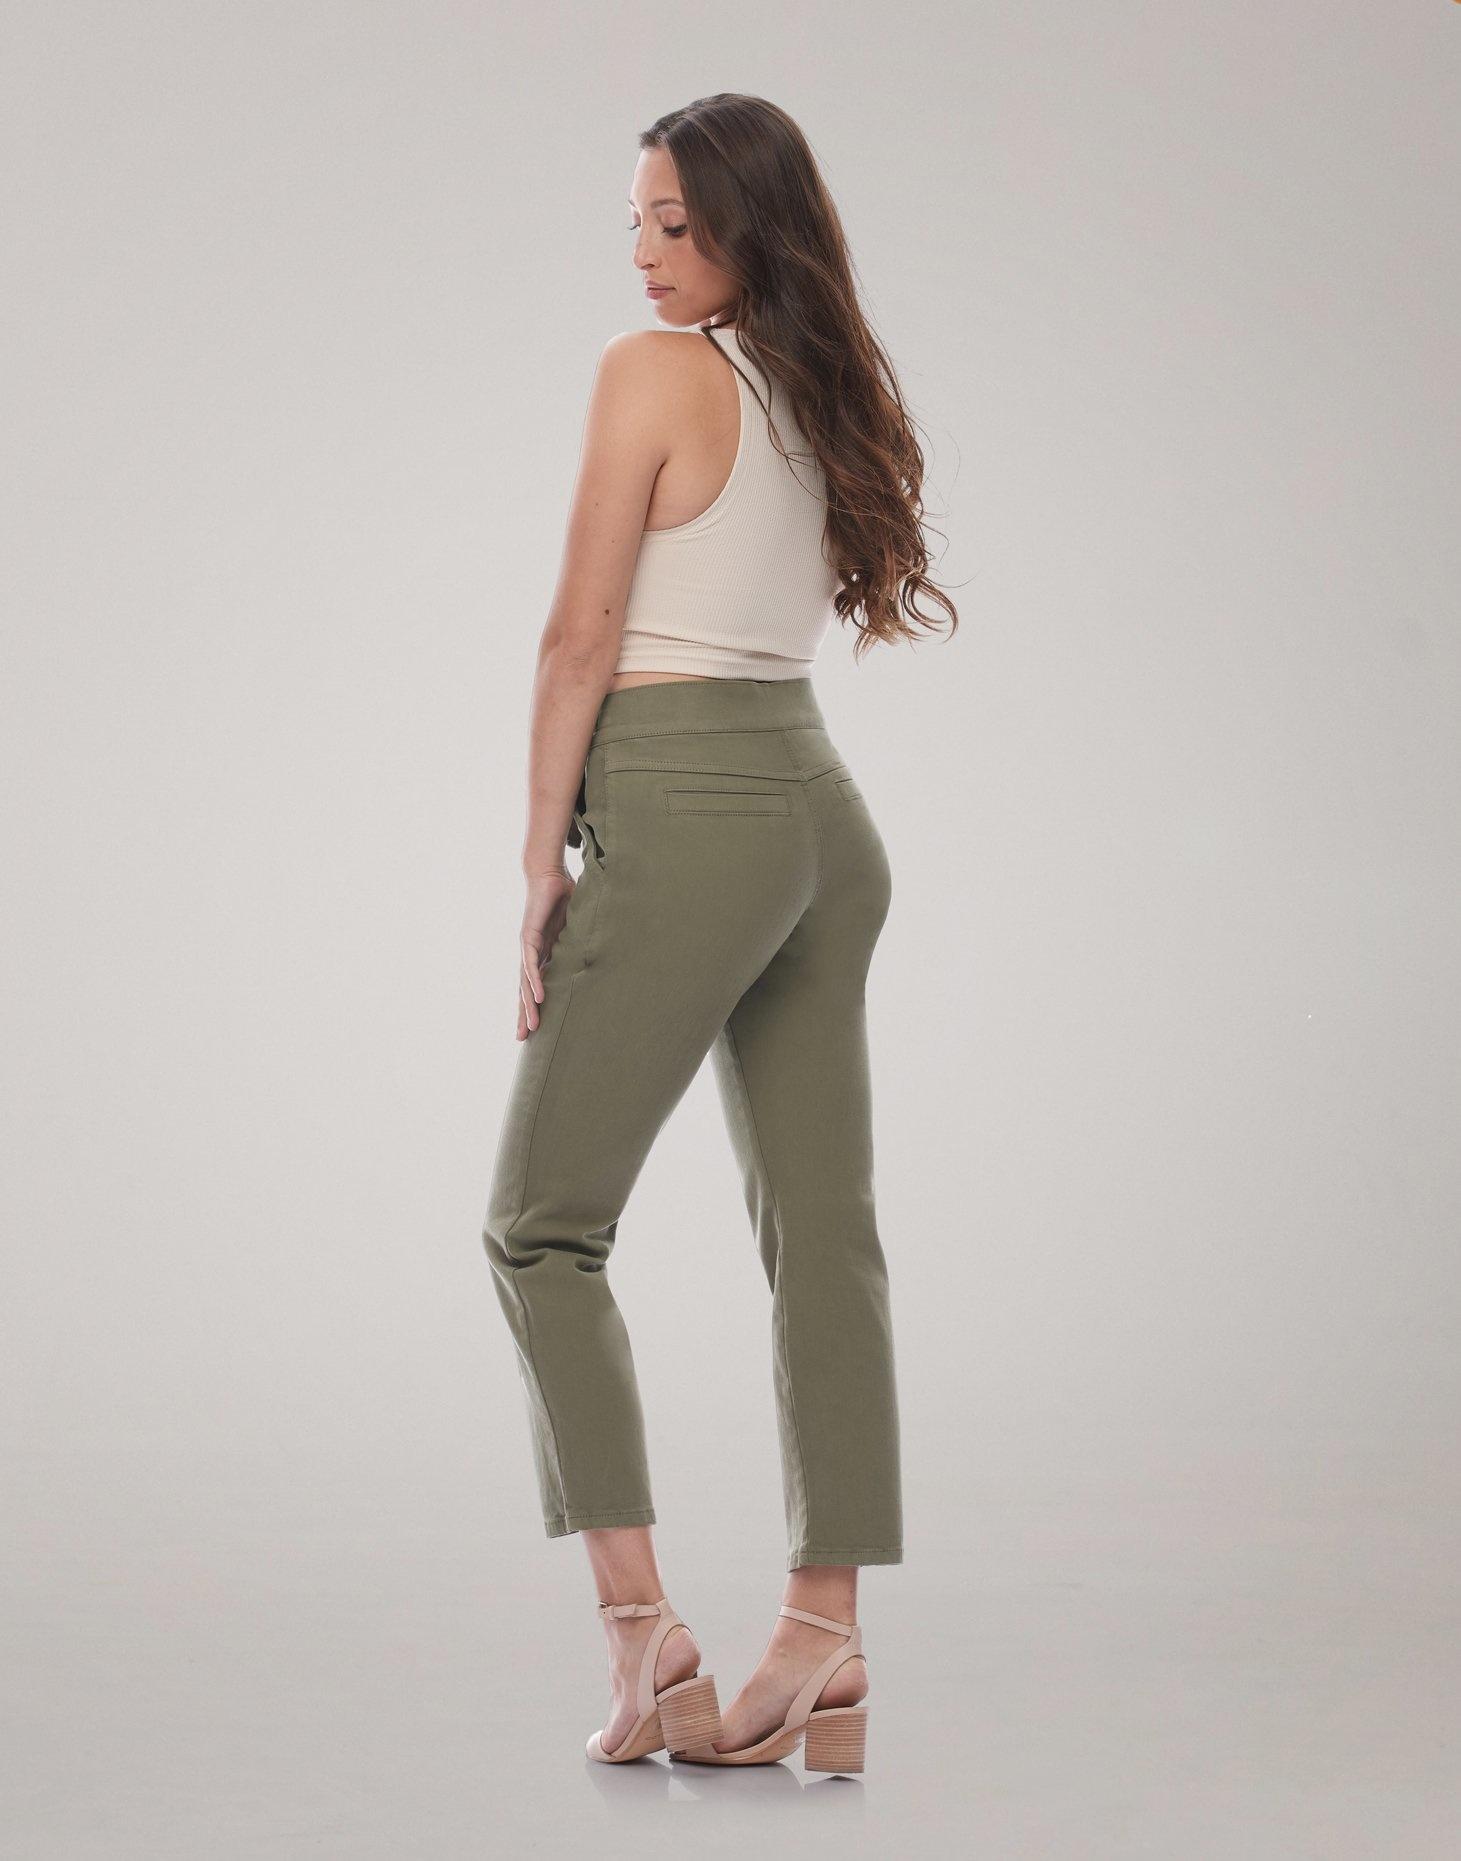 Yoga Jeans MALIA RELAXED SLIM JEANS / Route du Désert